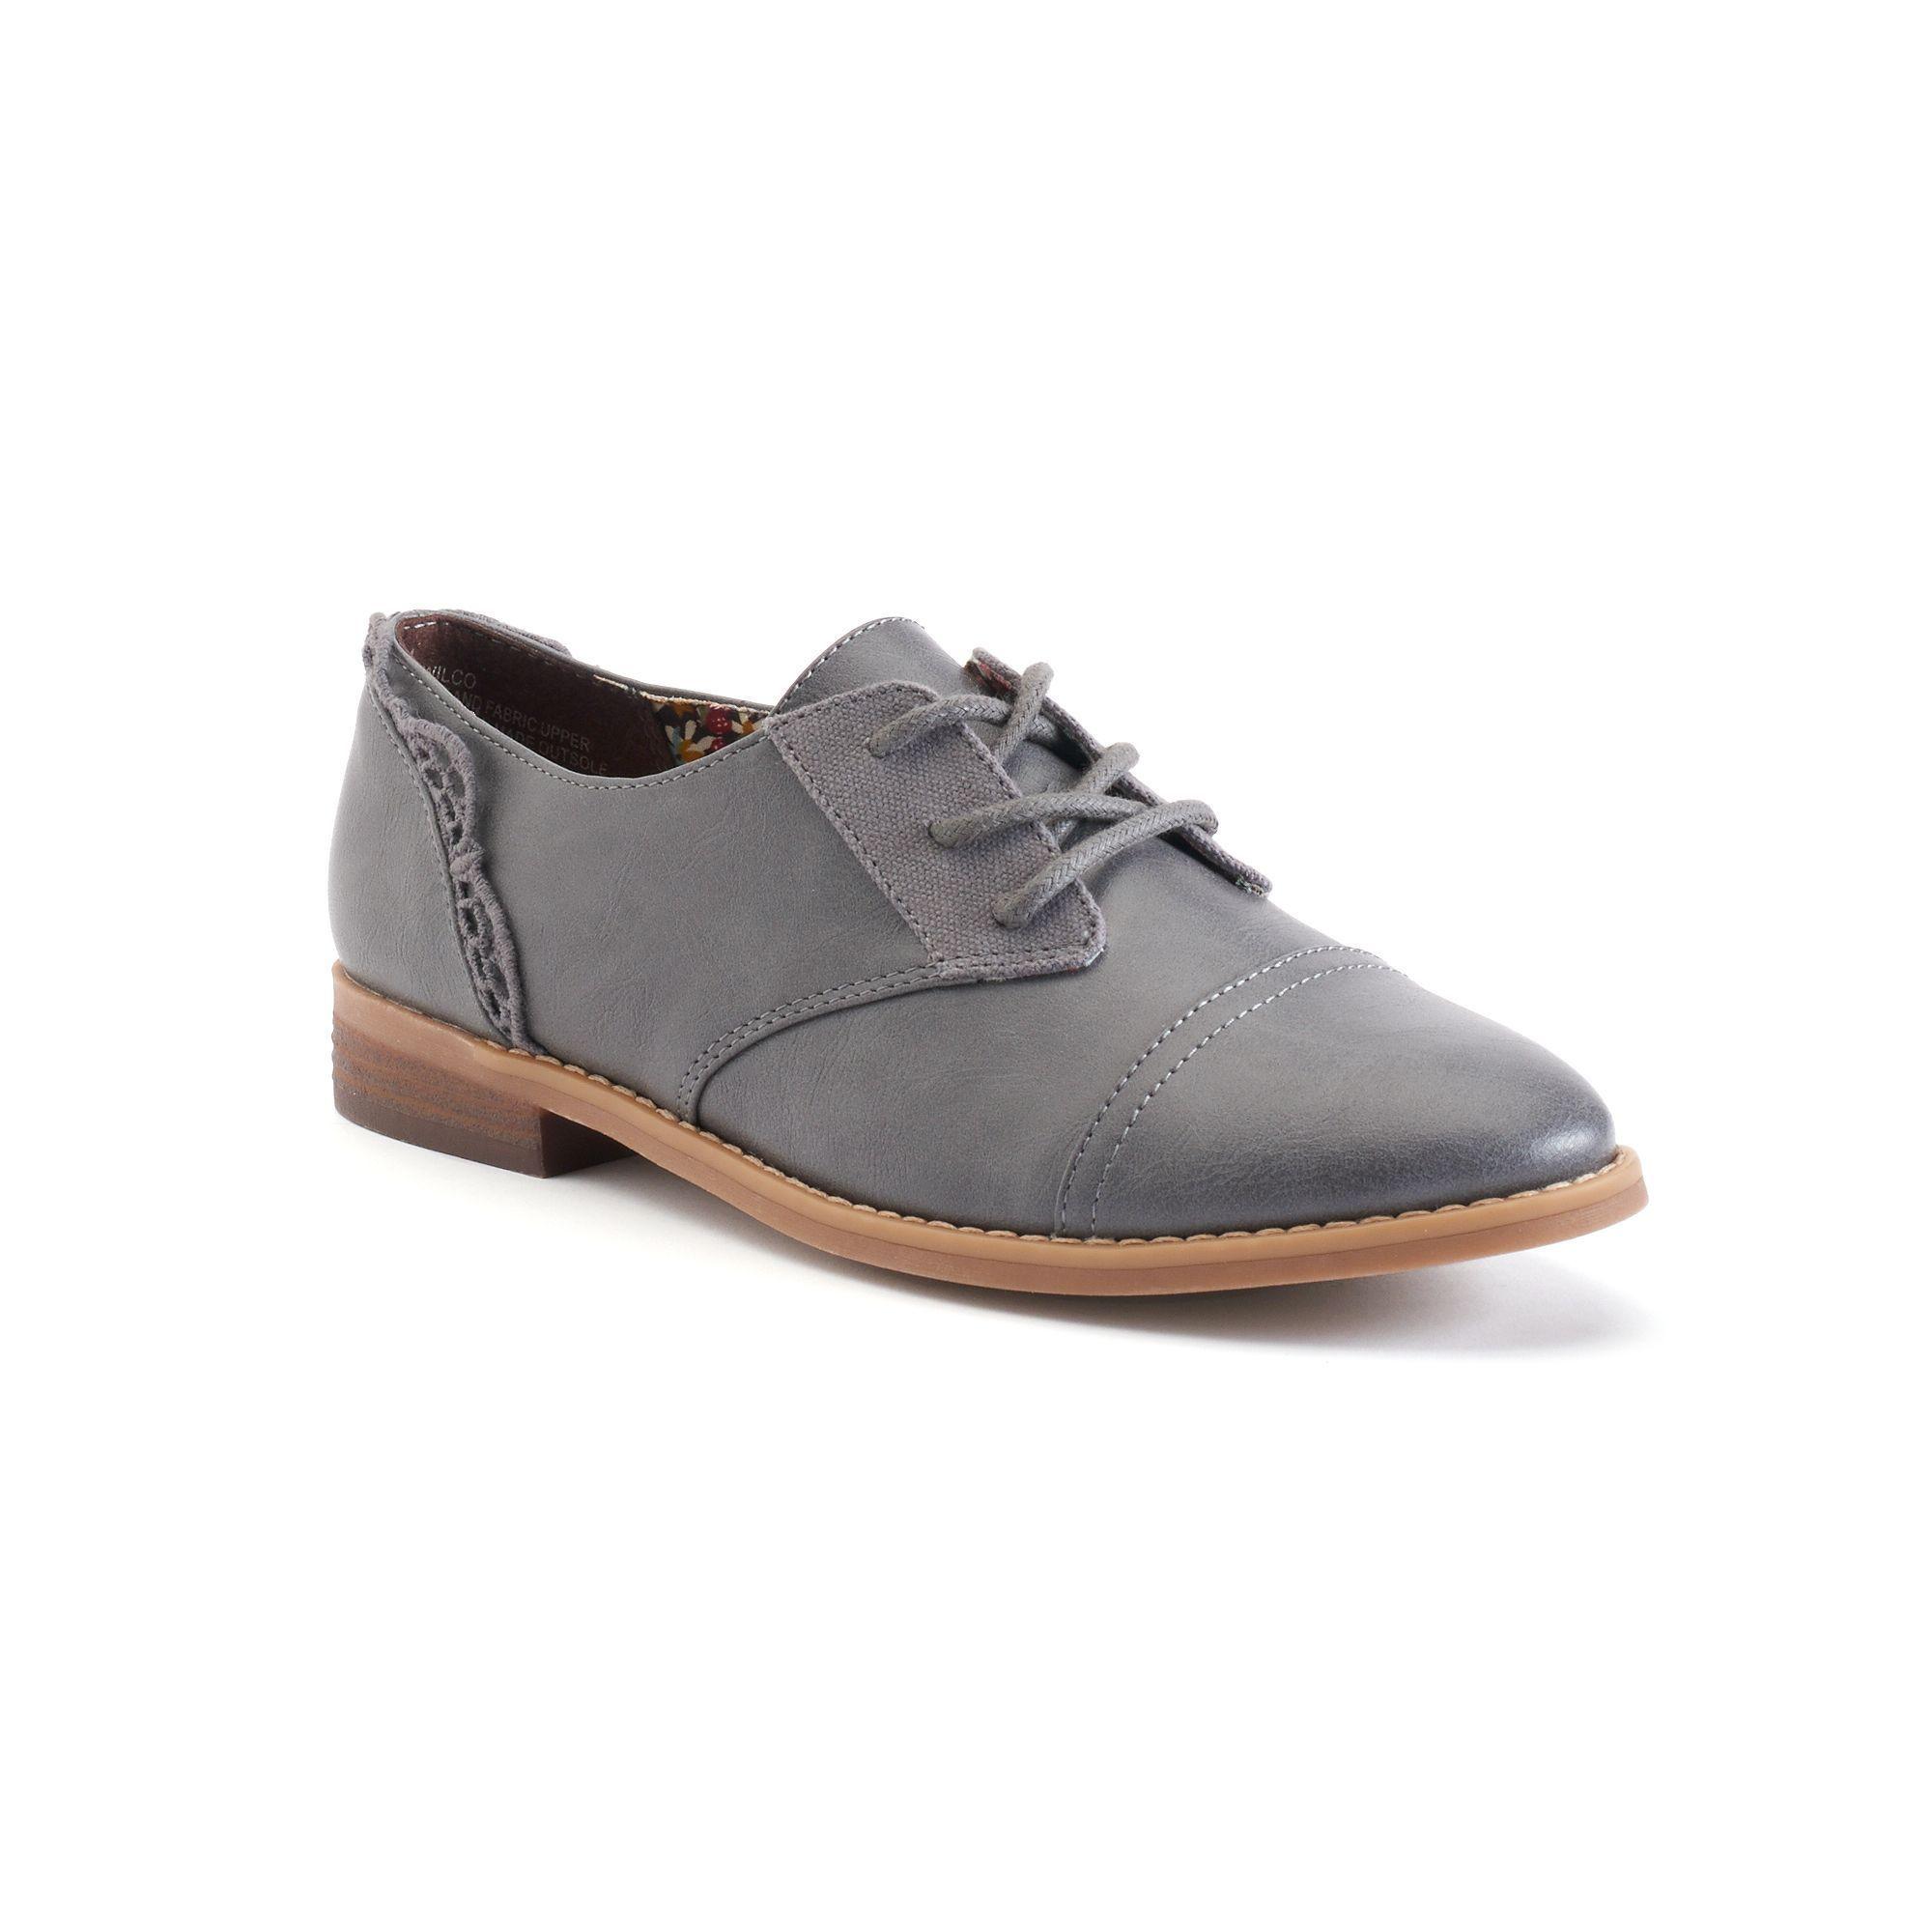 sugar Wilco Women's Cap Toe Oxford Shoes, Size: medium (6), Grey